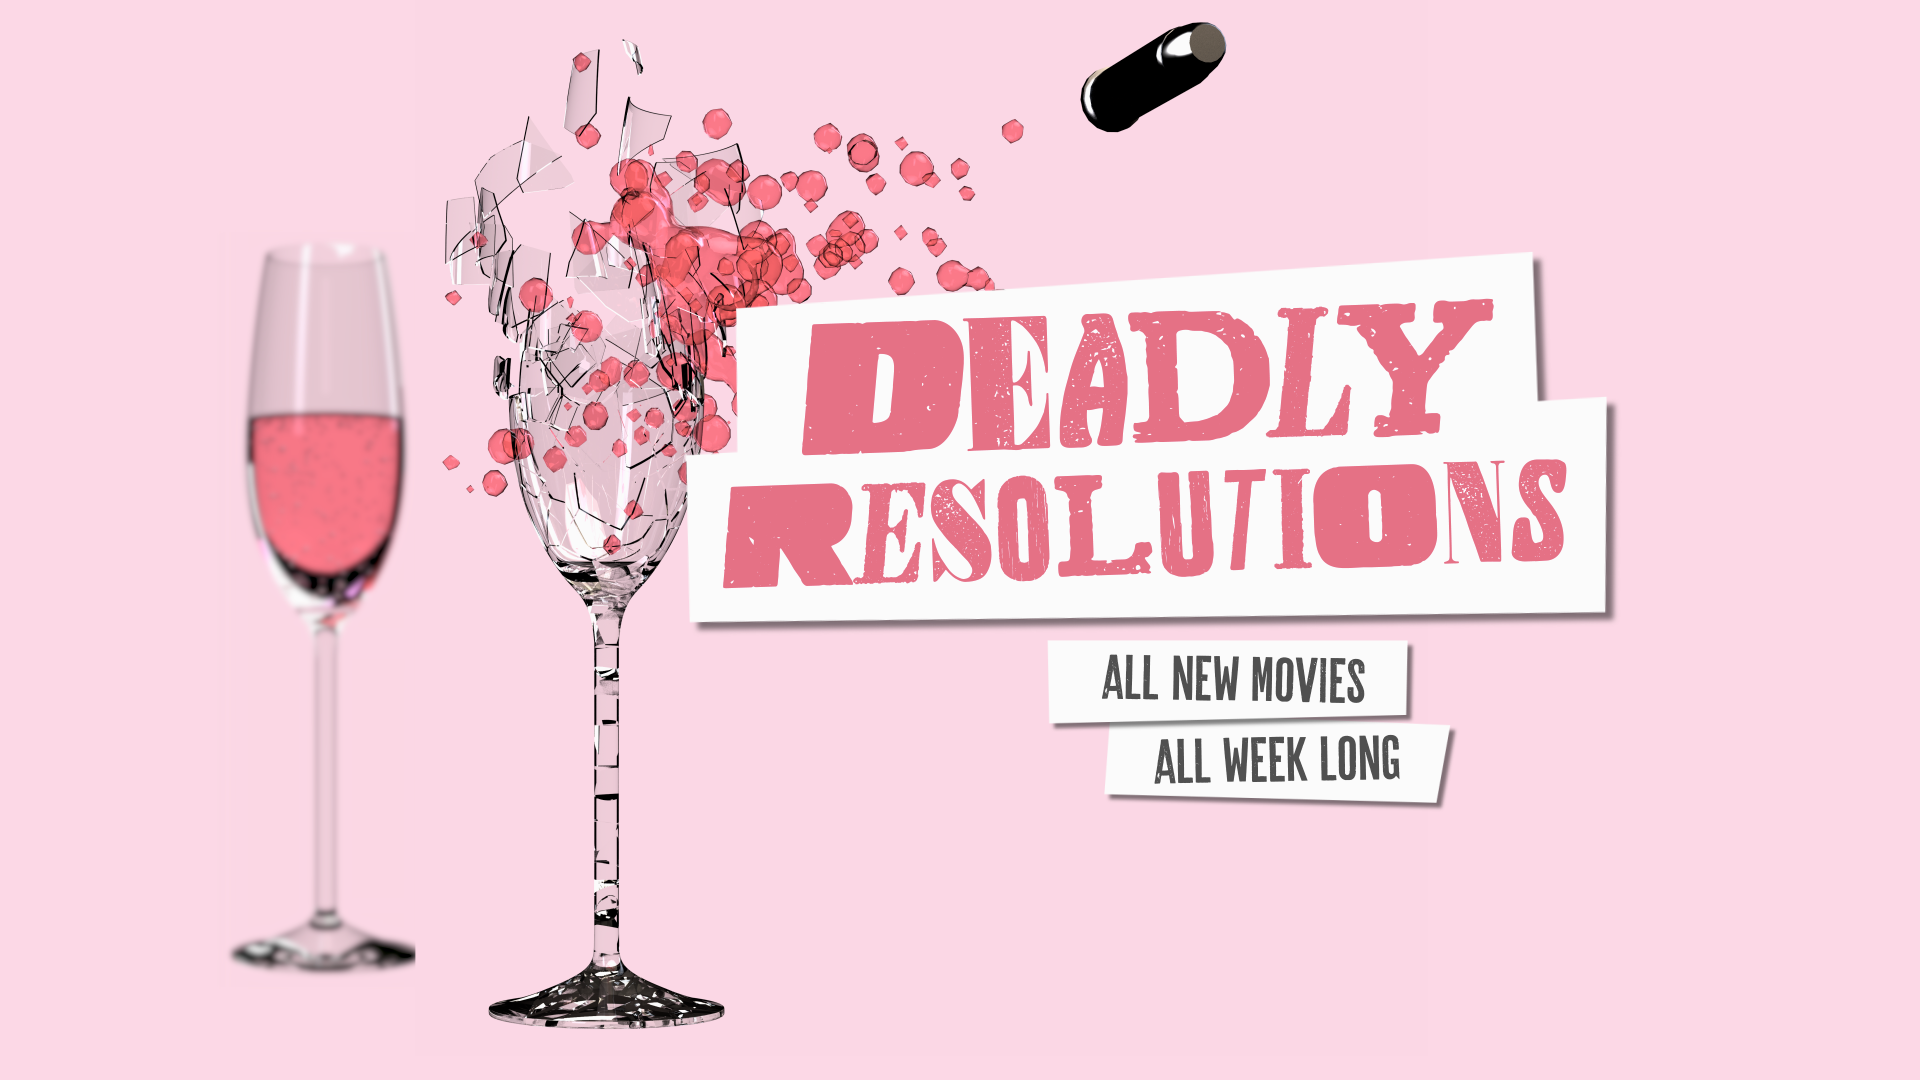 Lifetime_DeadlyResolutions_WeddingCake_EP (00000).png